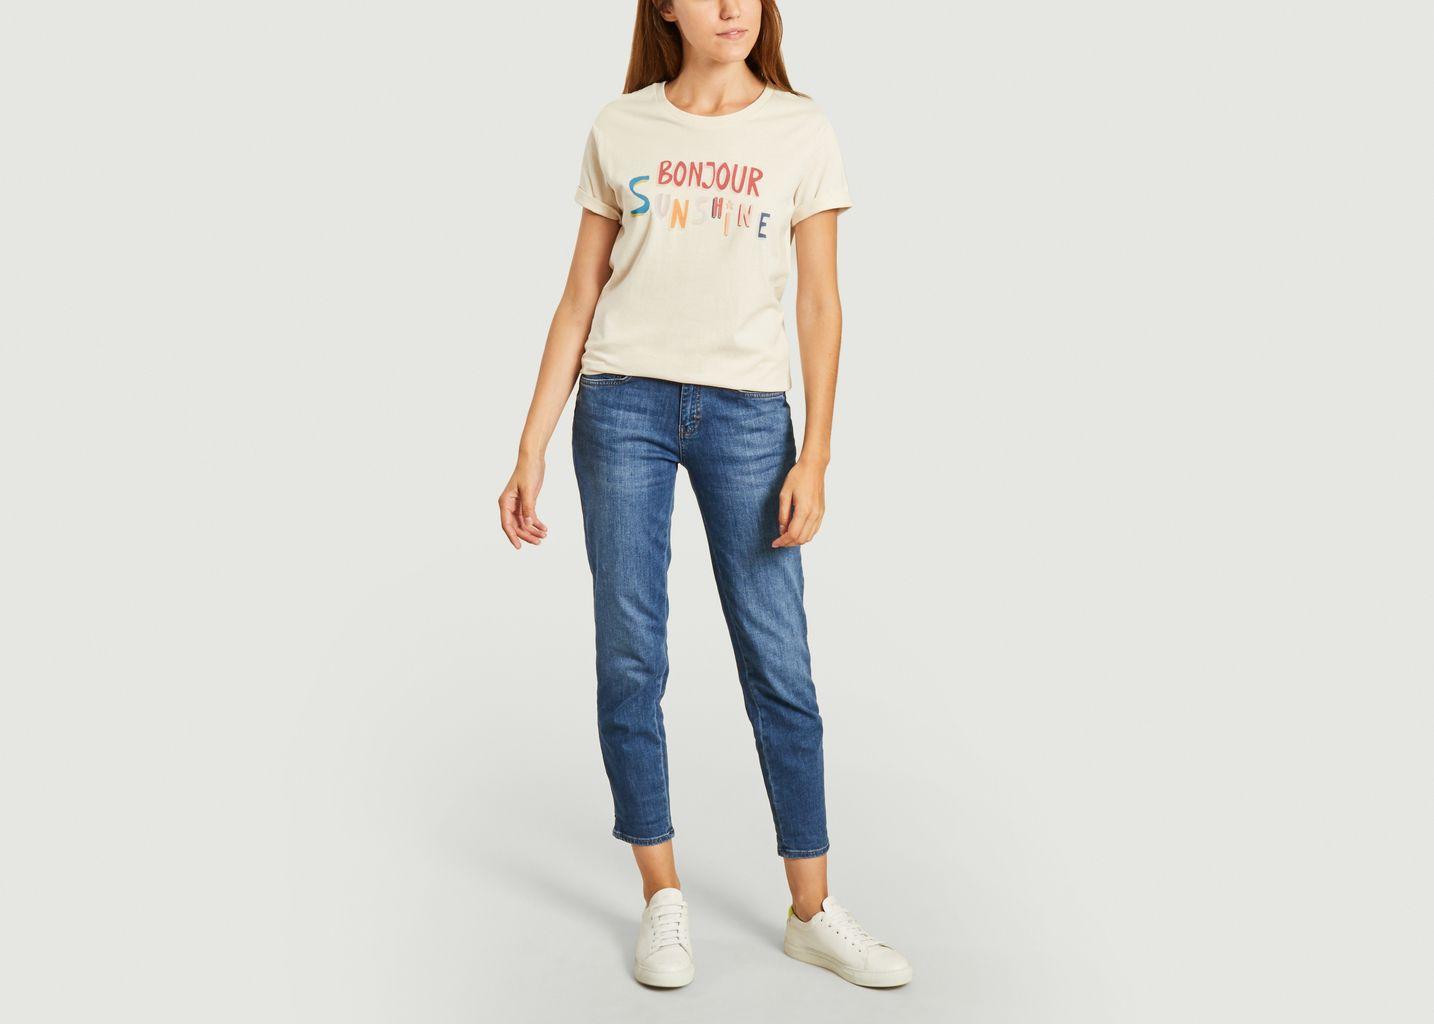 T-shirt bonjour sunshine - Elise Chalmin